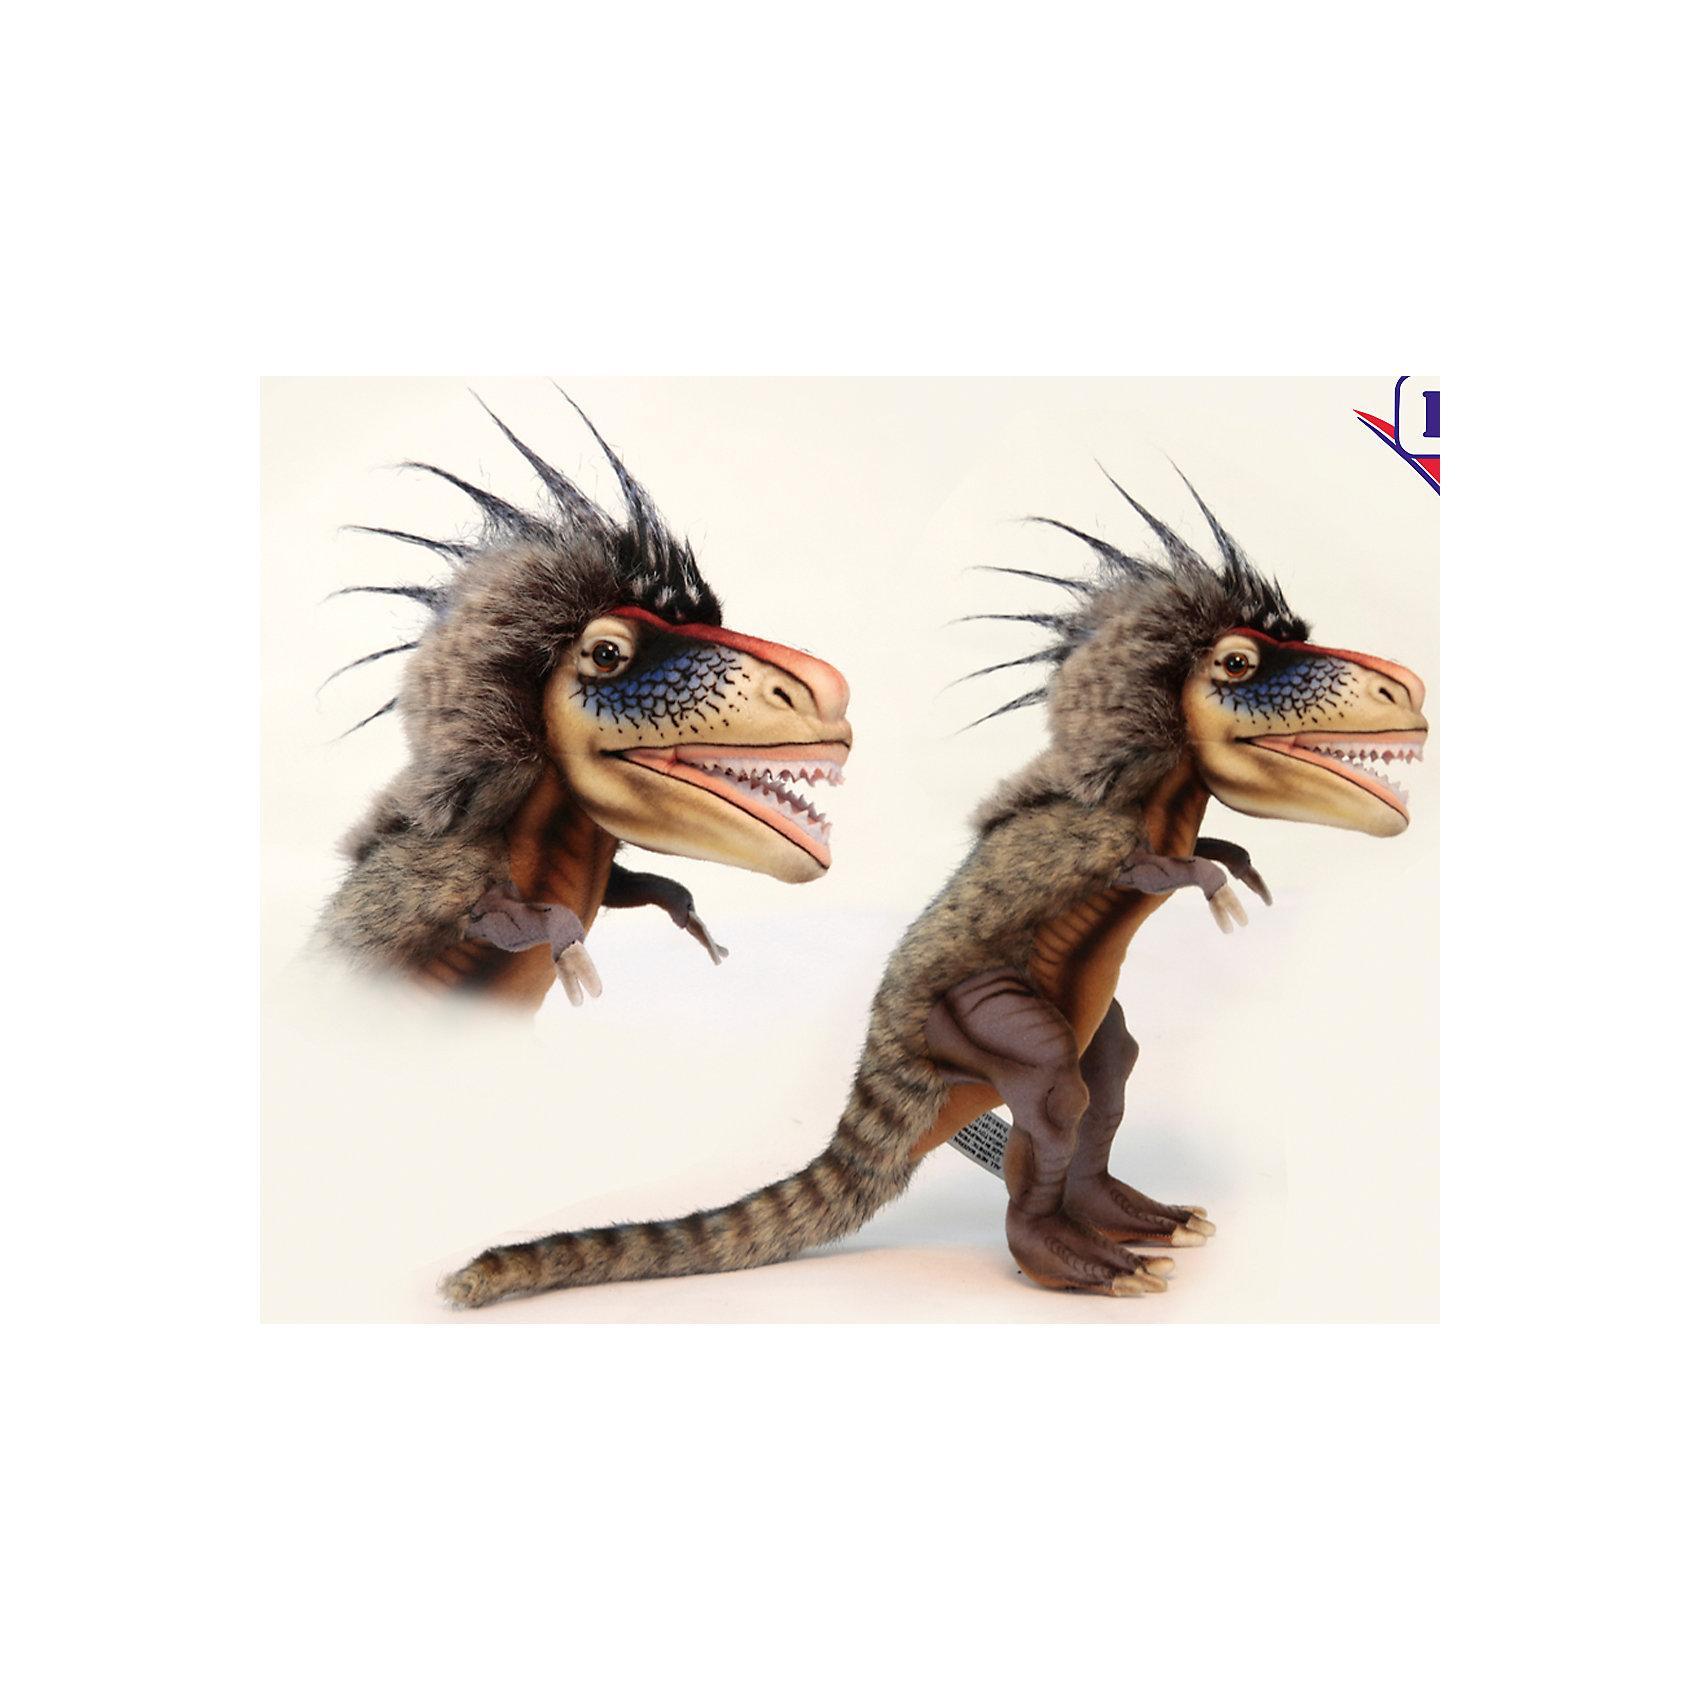 Hansa Динозавр Ти-рекс elc динозавр ти рекс